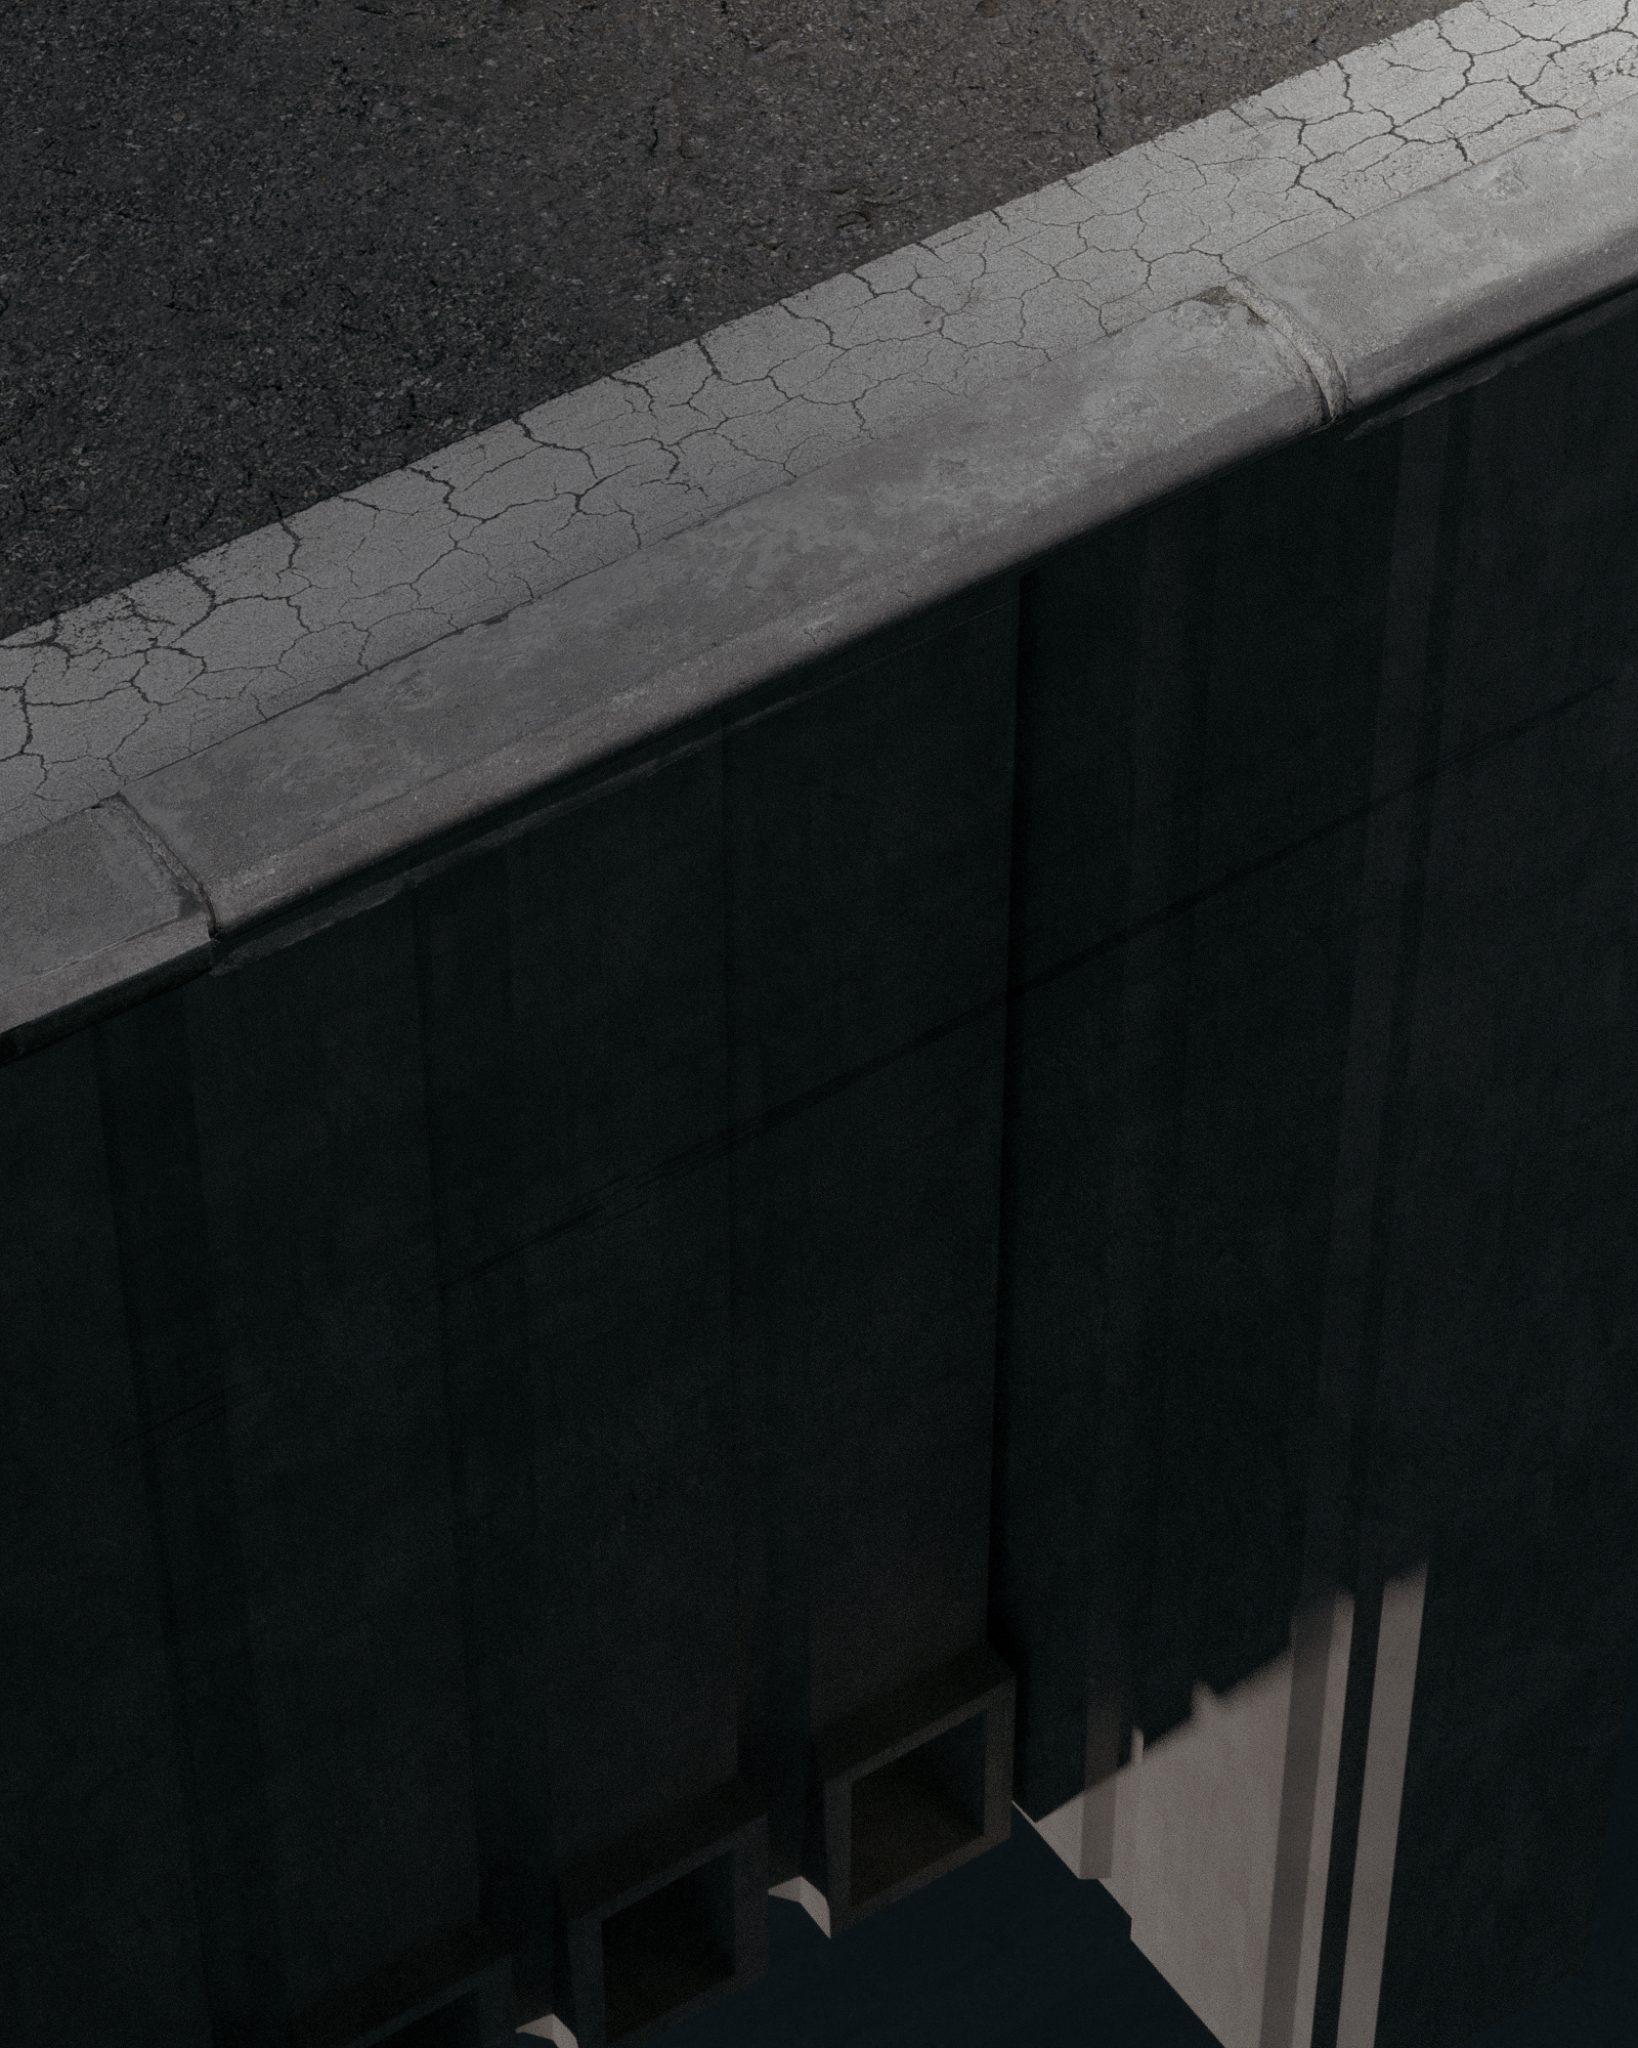 ignant-tesla-cybertruck-cgi-brutalism-cgi-editorial-1-1638×2048